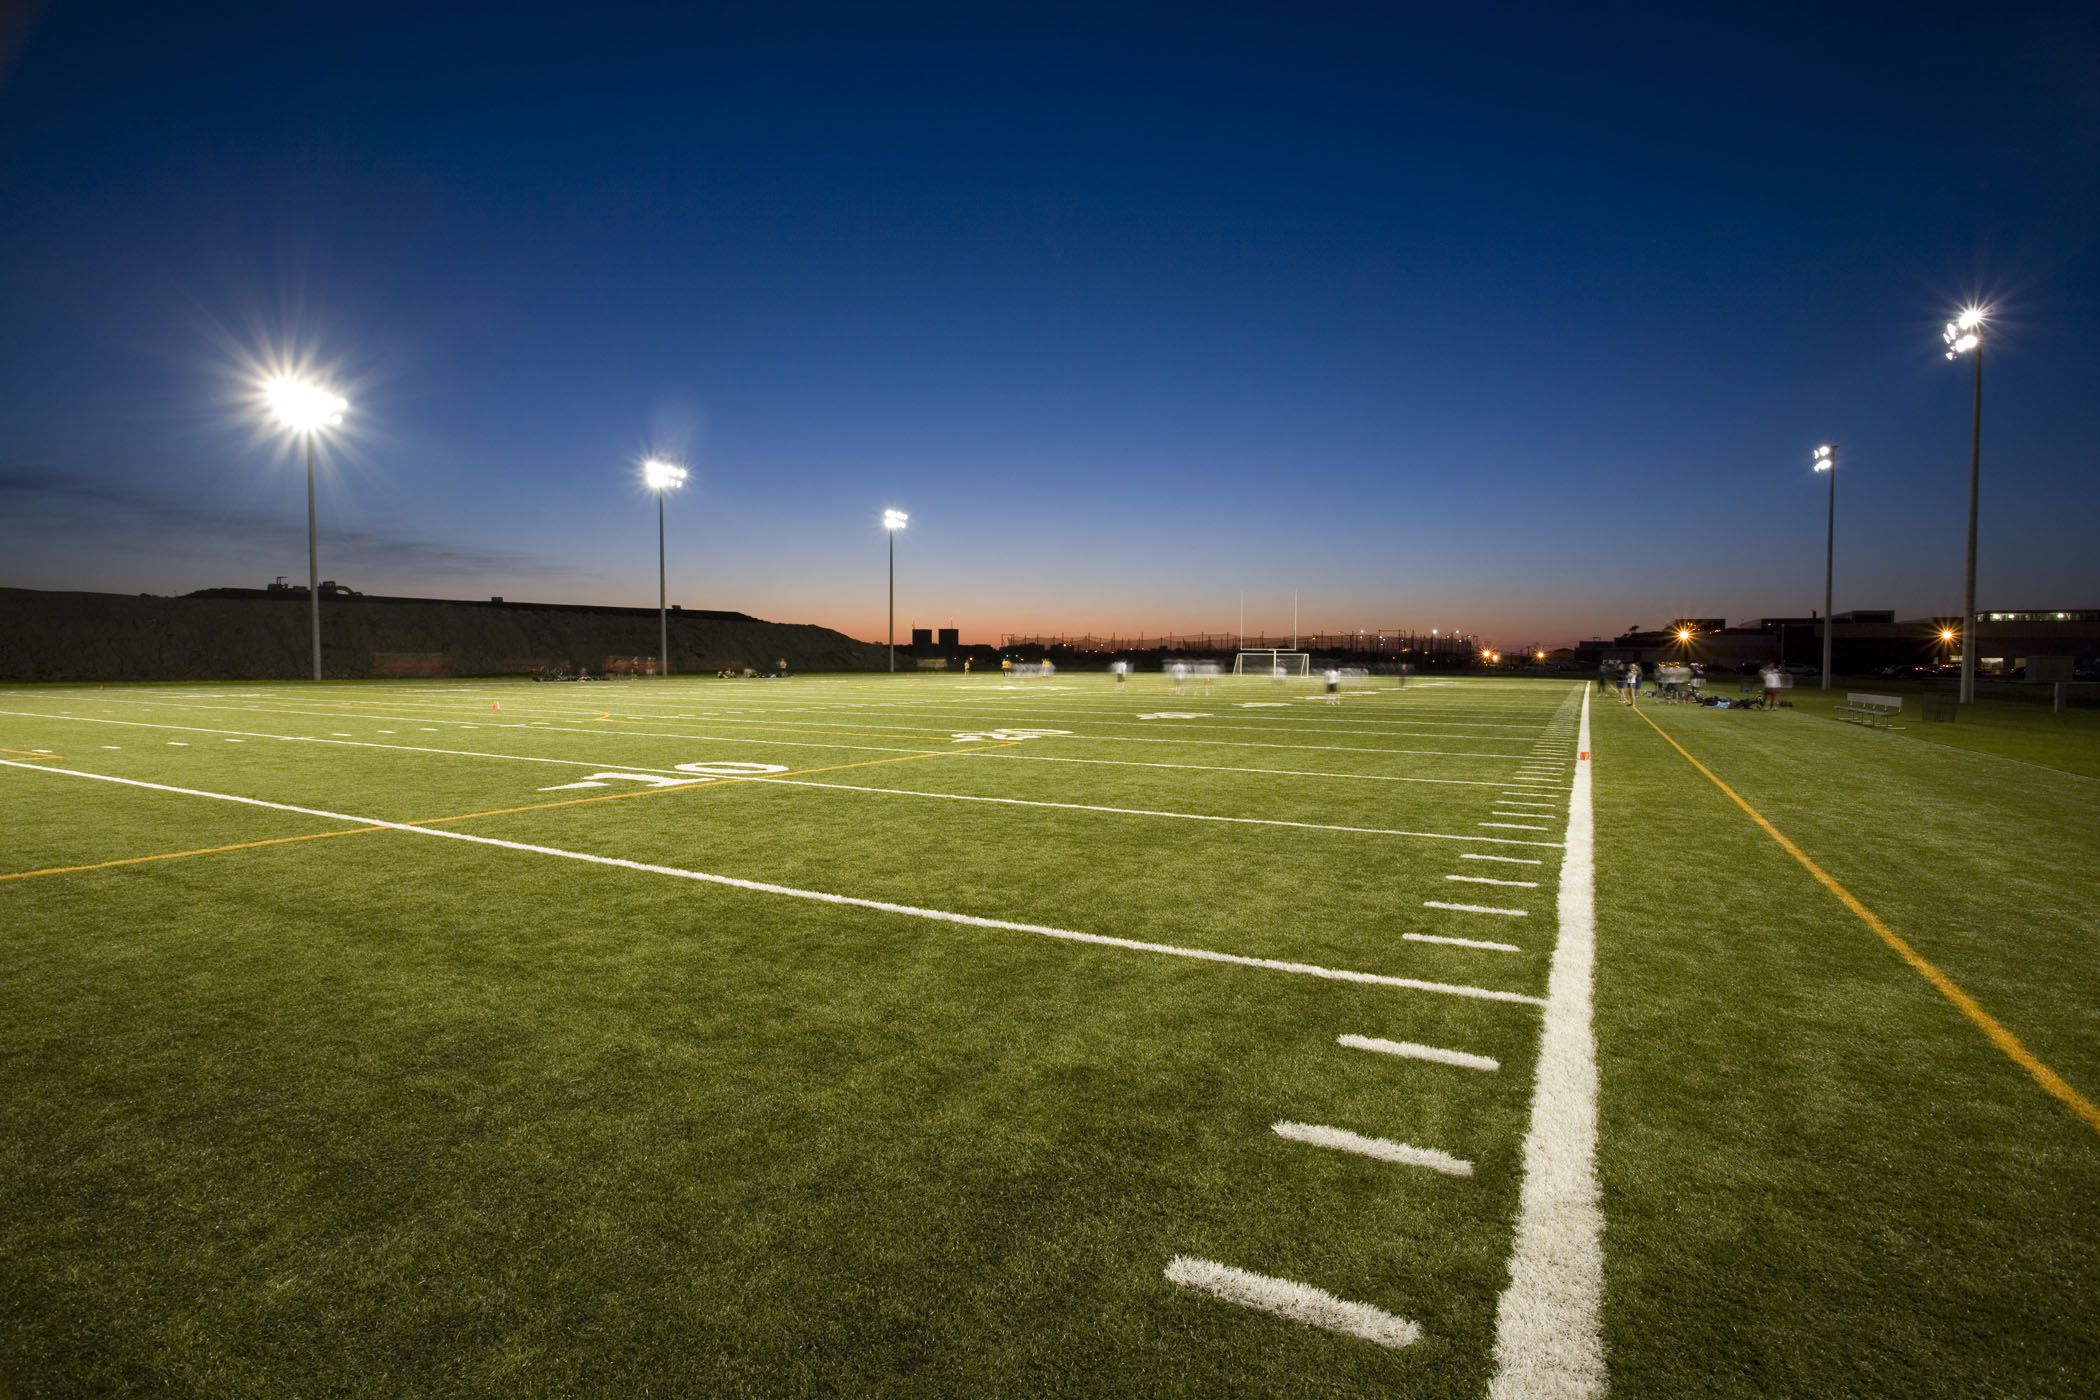 Football Field Wallpaper For Home Wallpapersafari